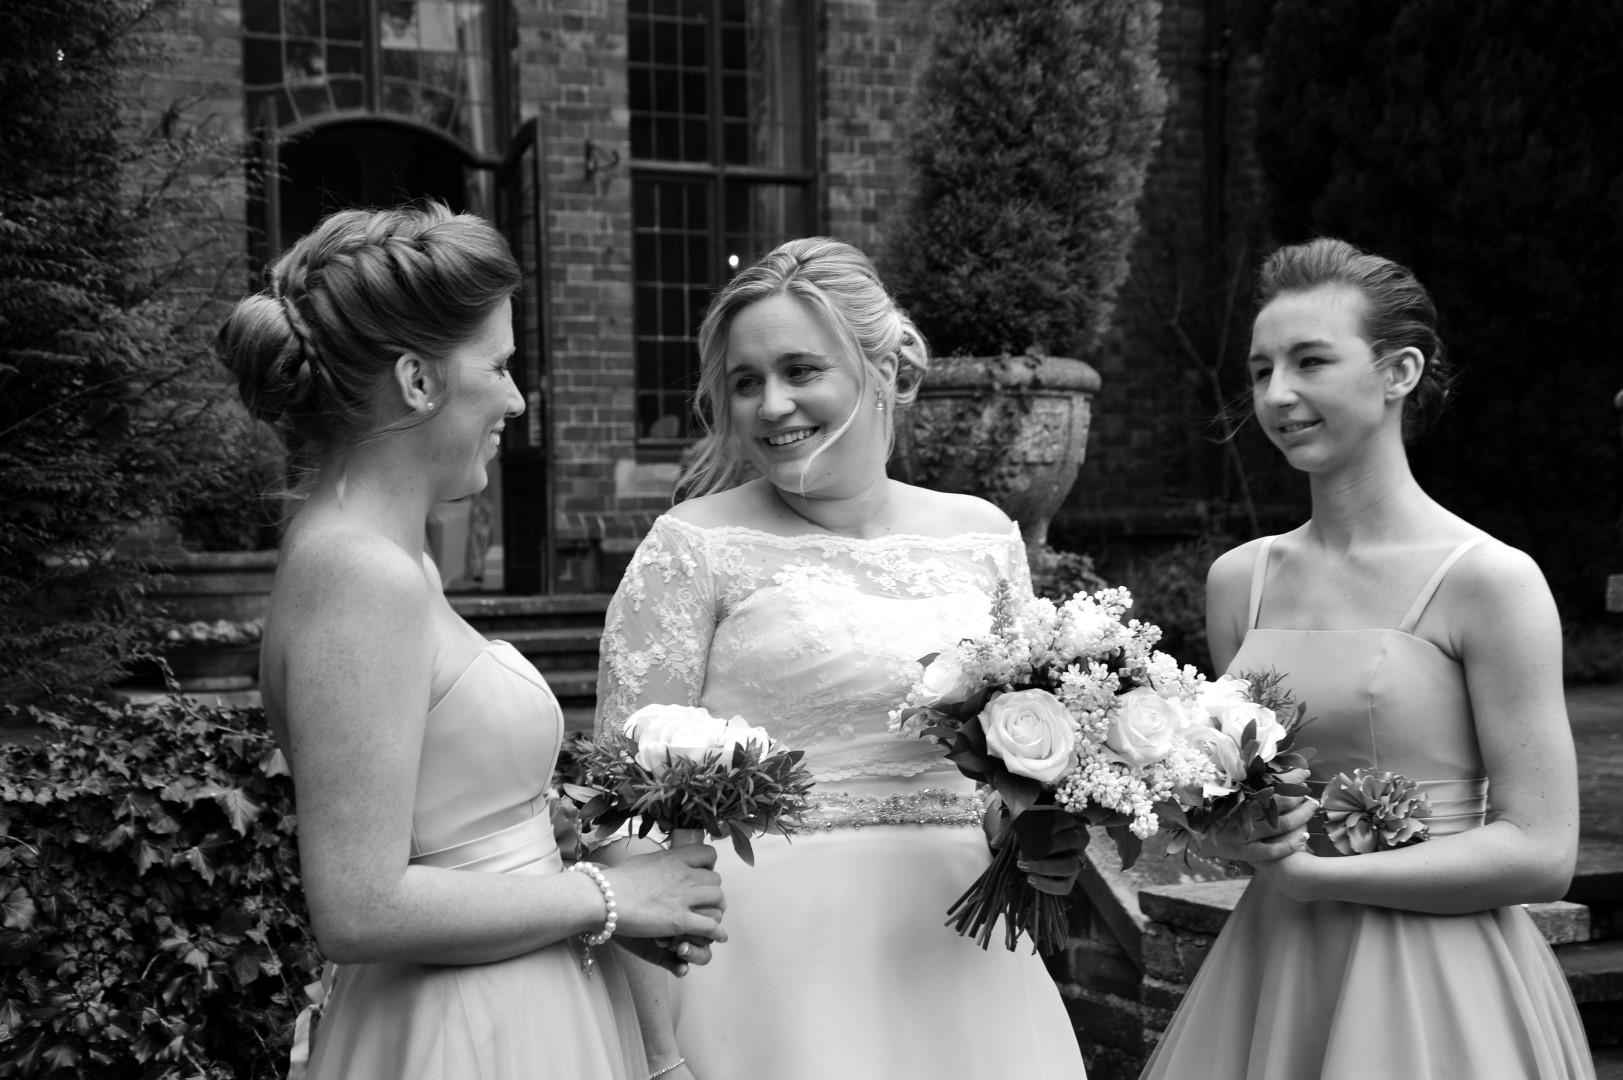 wedding-photographer-yorkshire (2)